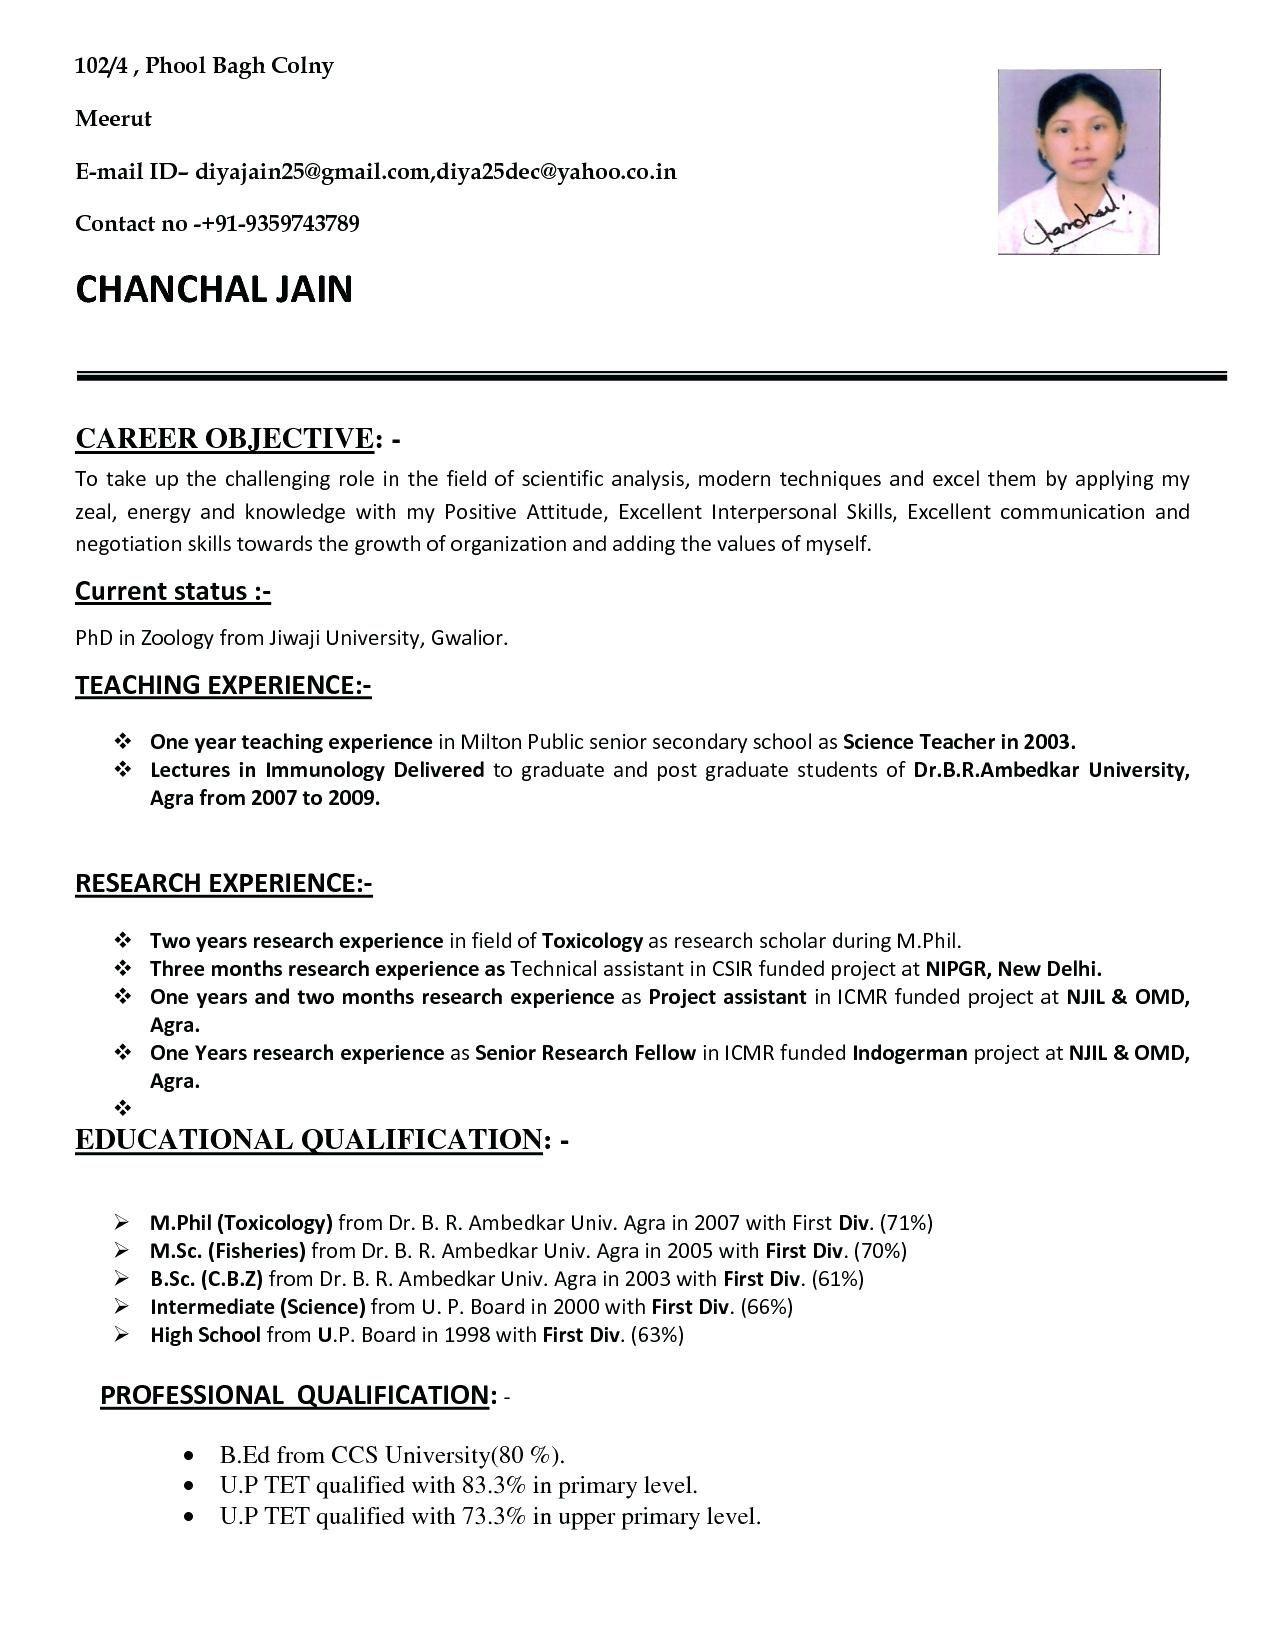 008 Impressive Resume Sample For Teaching Job In India Design  School Principal PositionFull